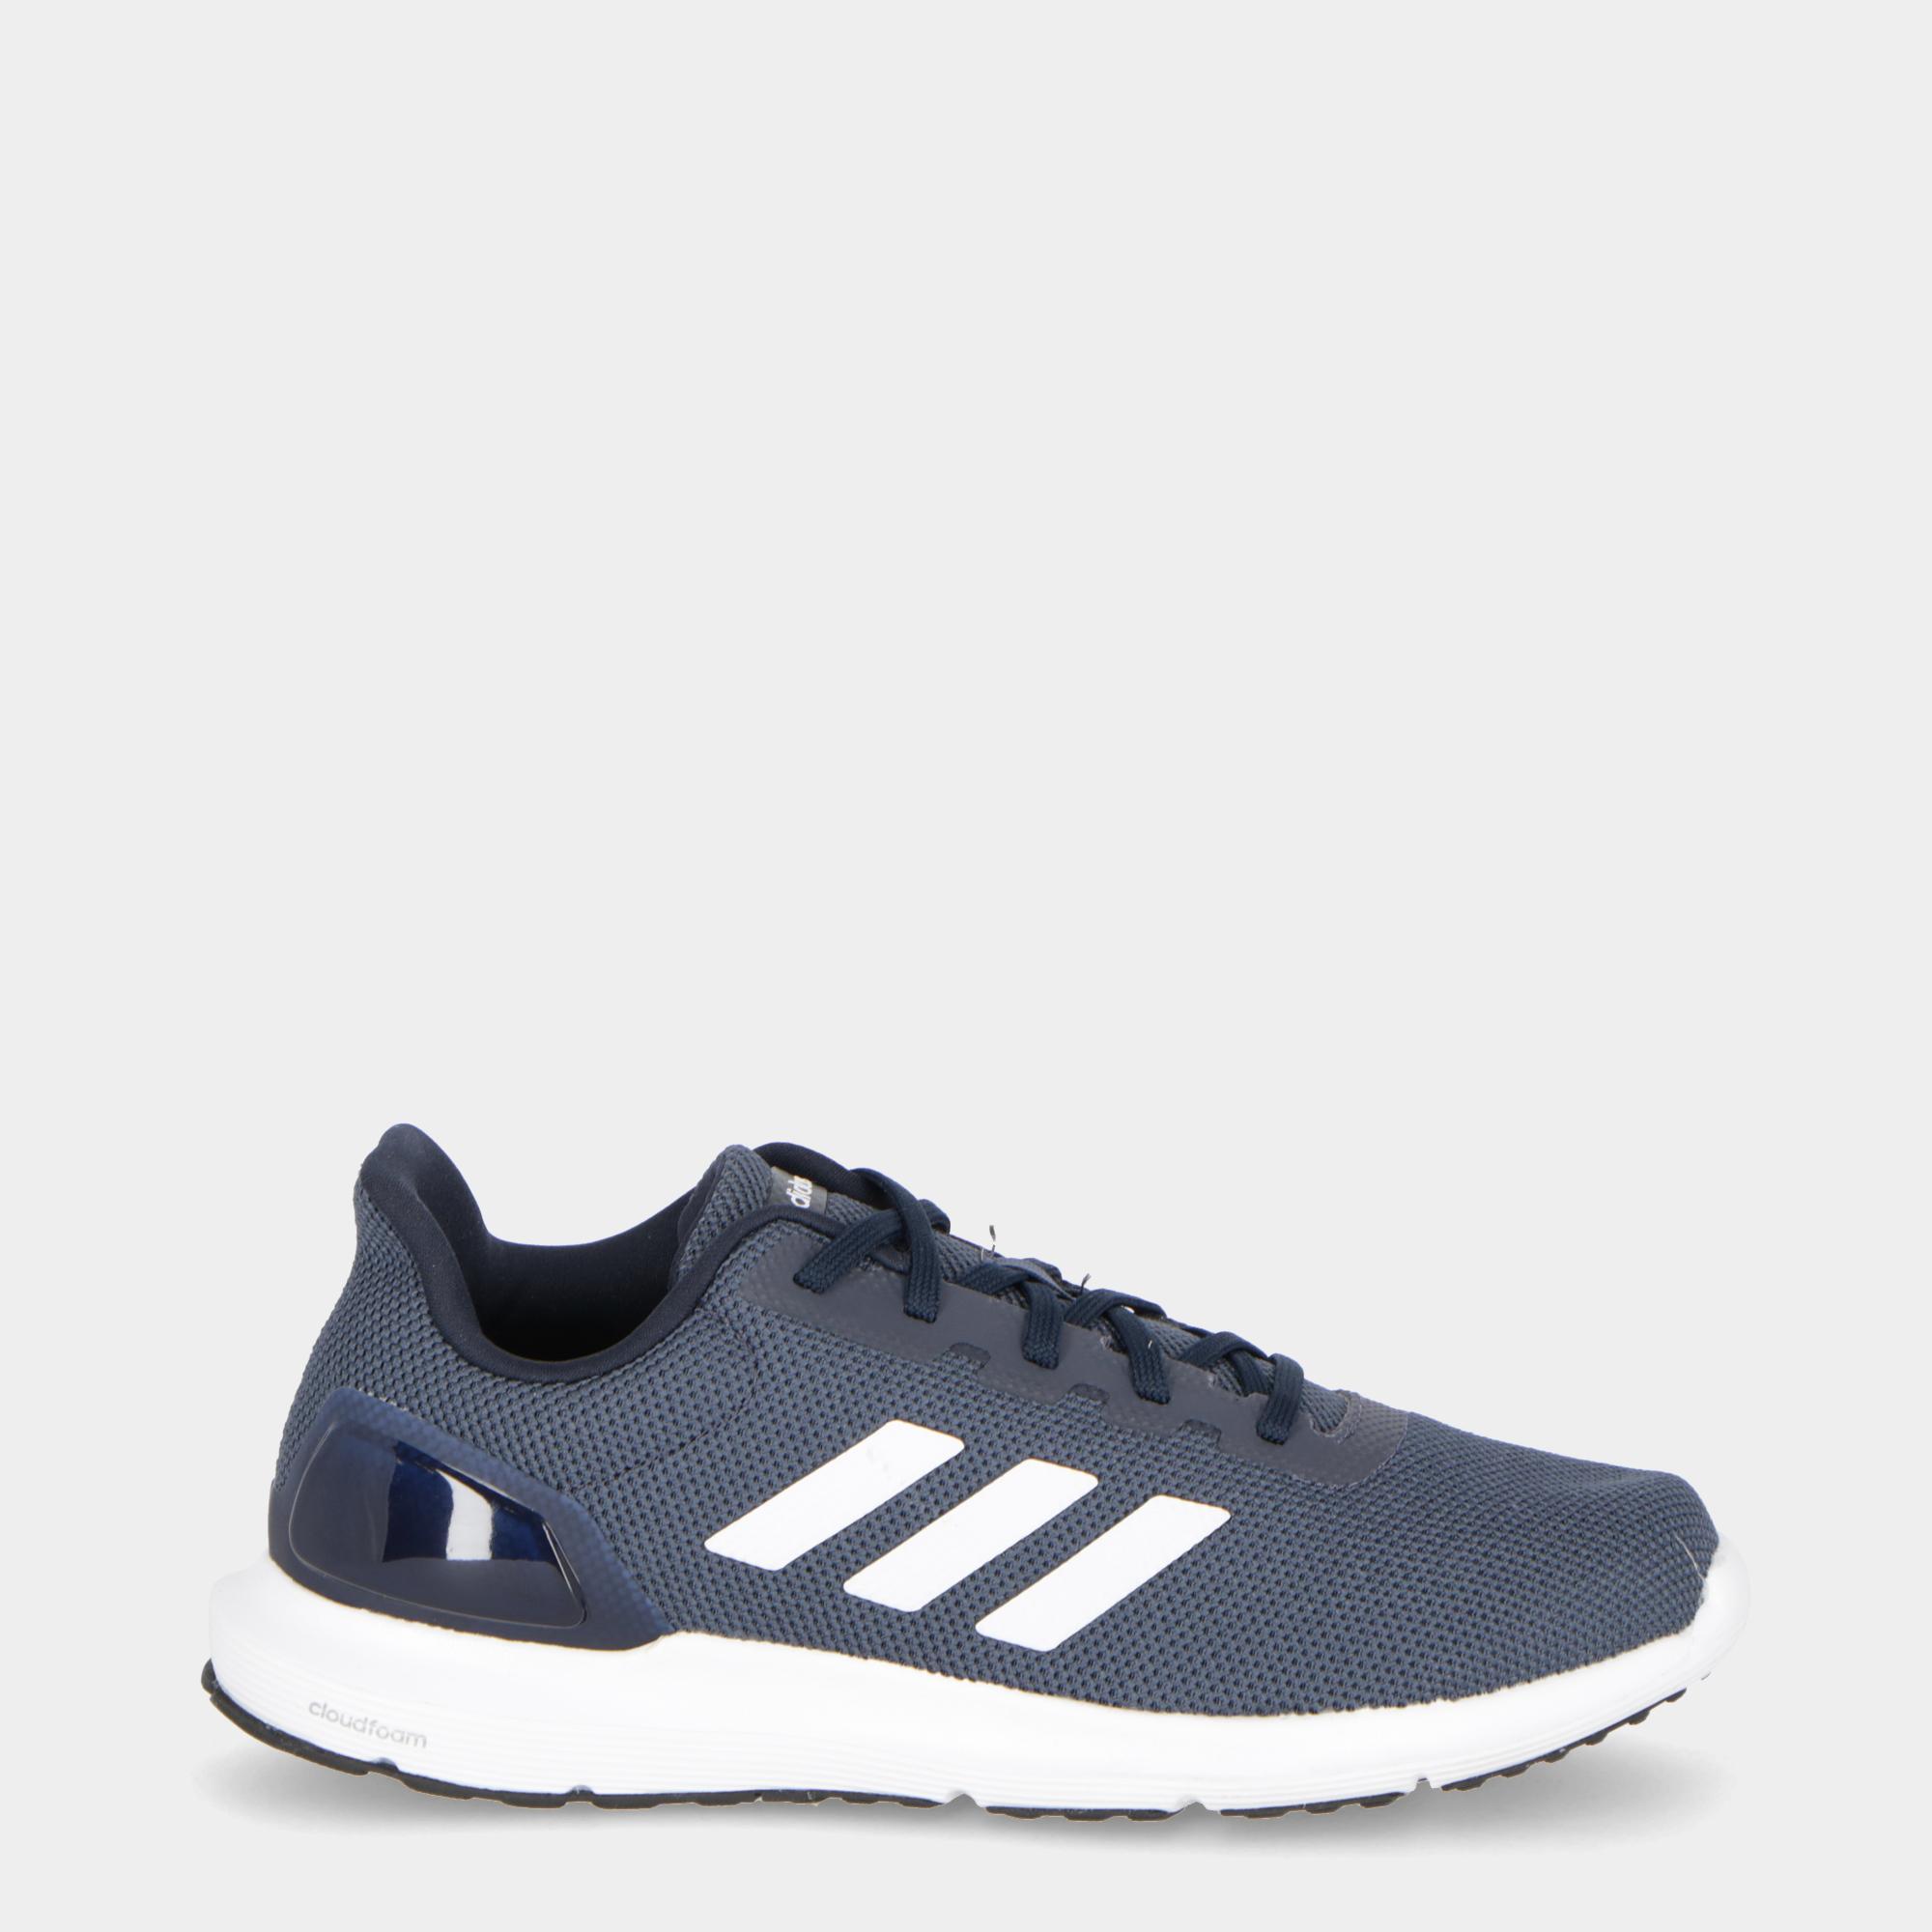 3c2fd0045 Adidas Cosmic 2 Blue White Ink